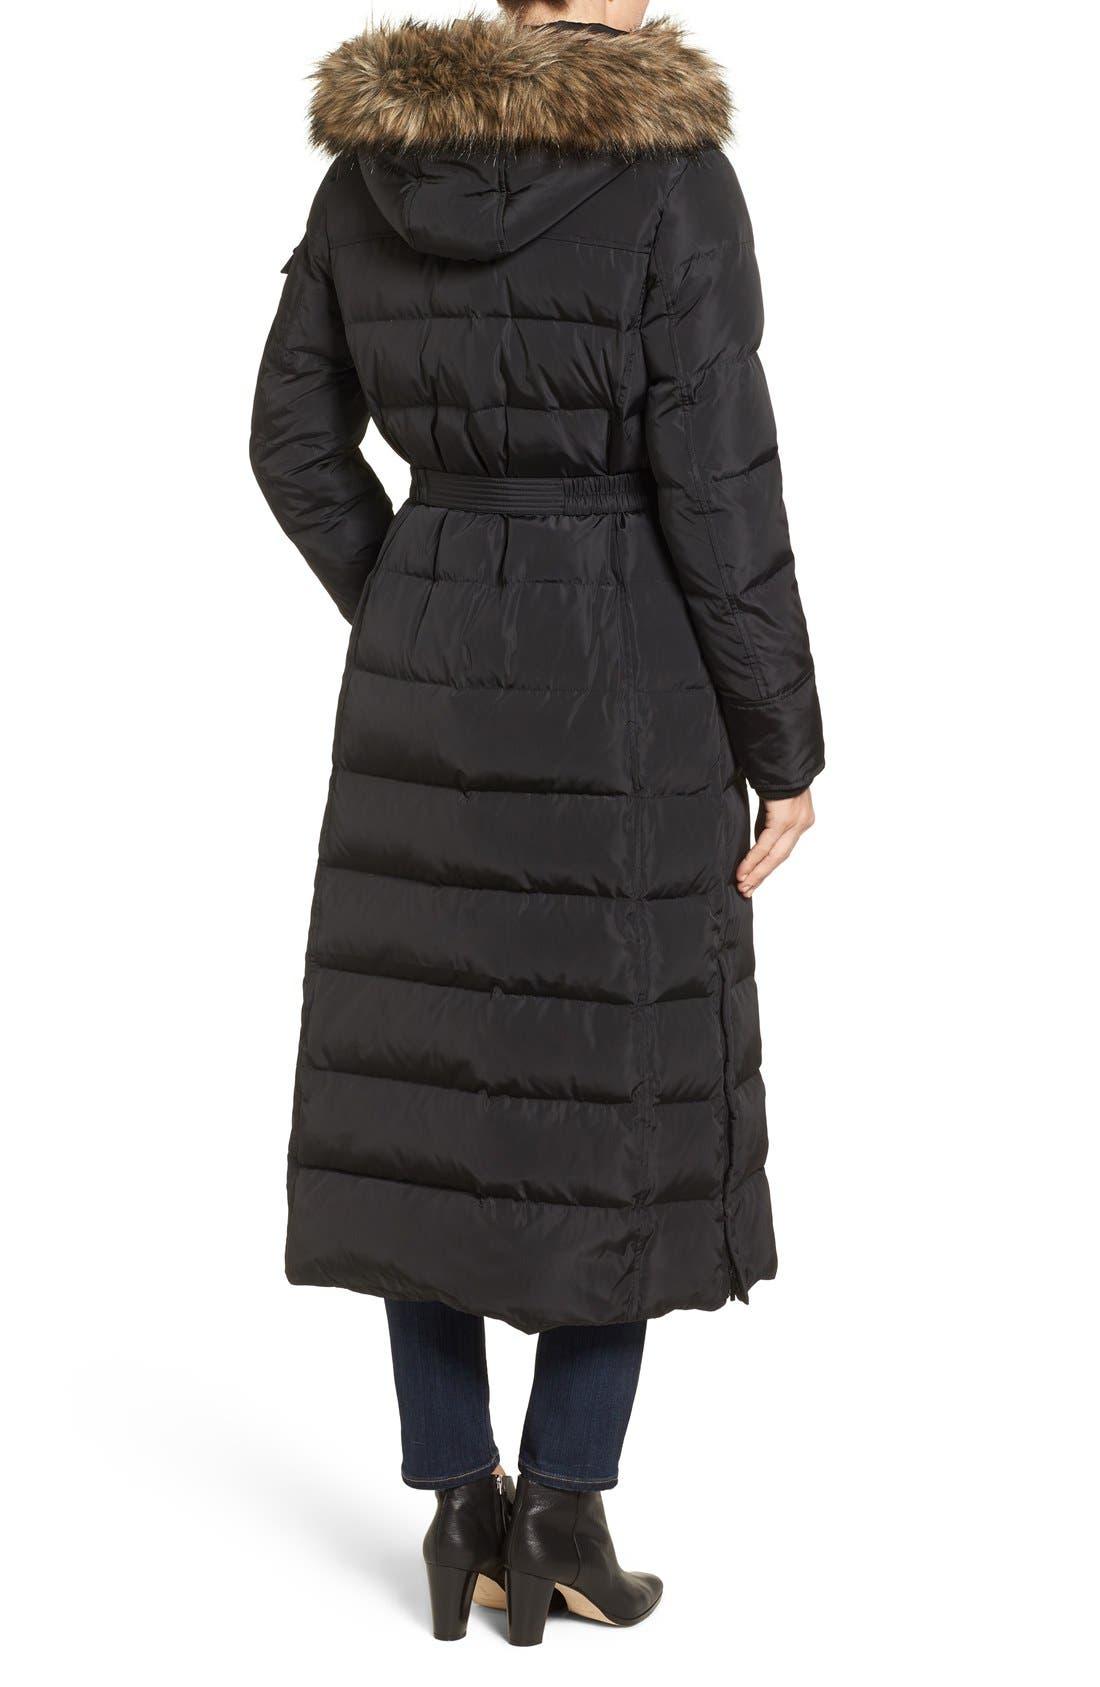 KORS MICHAEL KORS, Faux Fur Trim Belted Down & Feather Fill Maxi Coat, Alternate thumbnail 2, color, 001